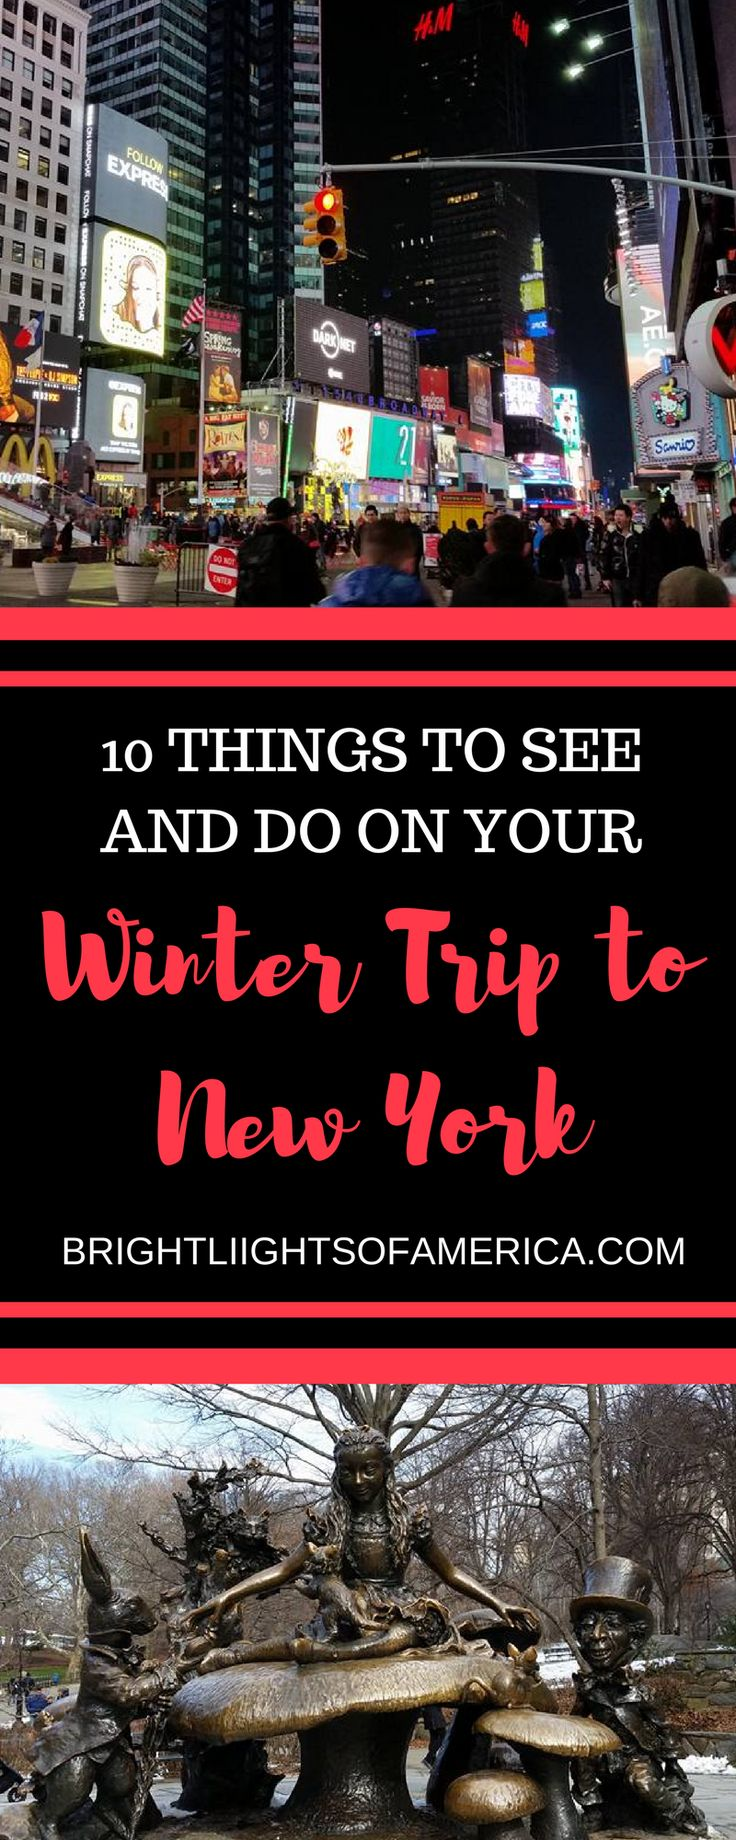 214 besten best of bright lights in america bilder auf for New york winter things to do